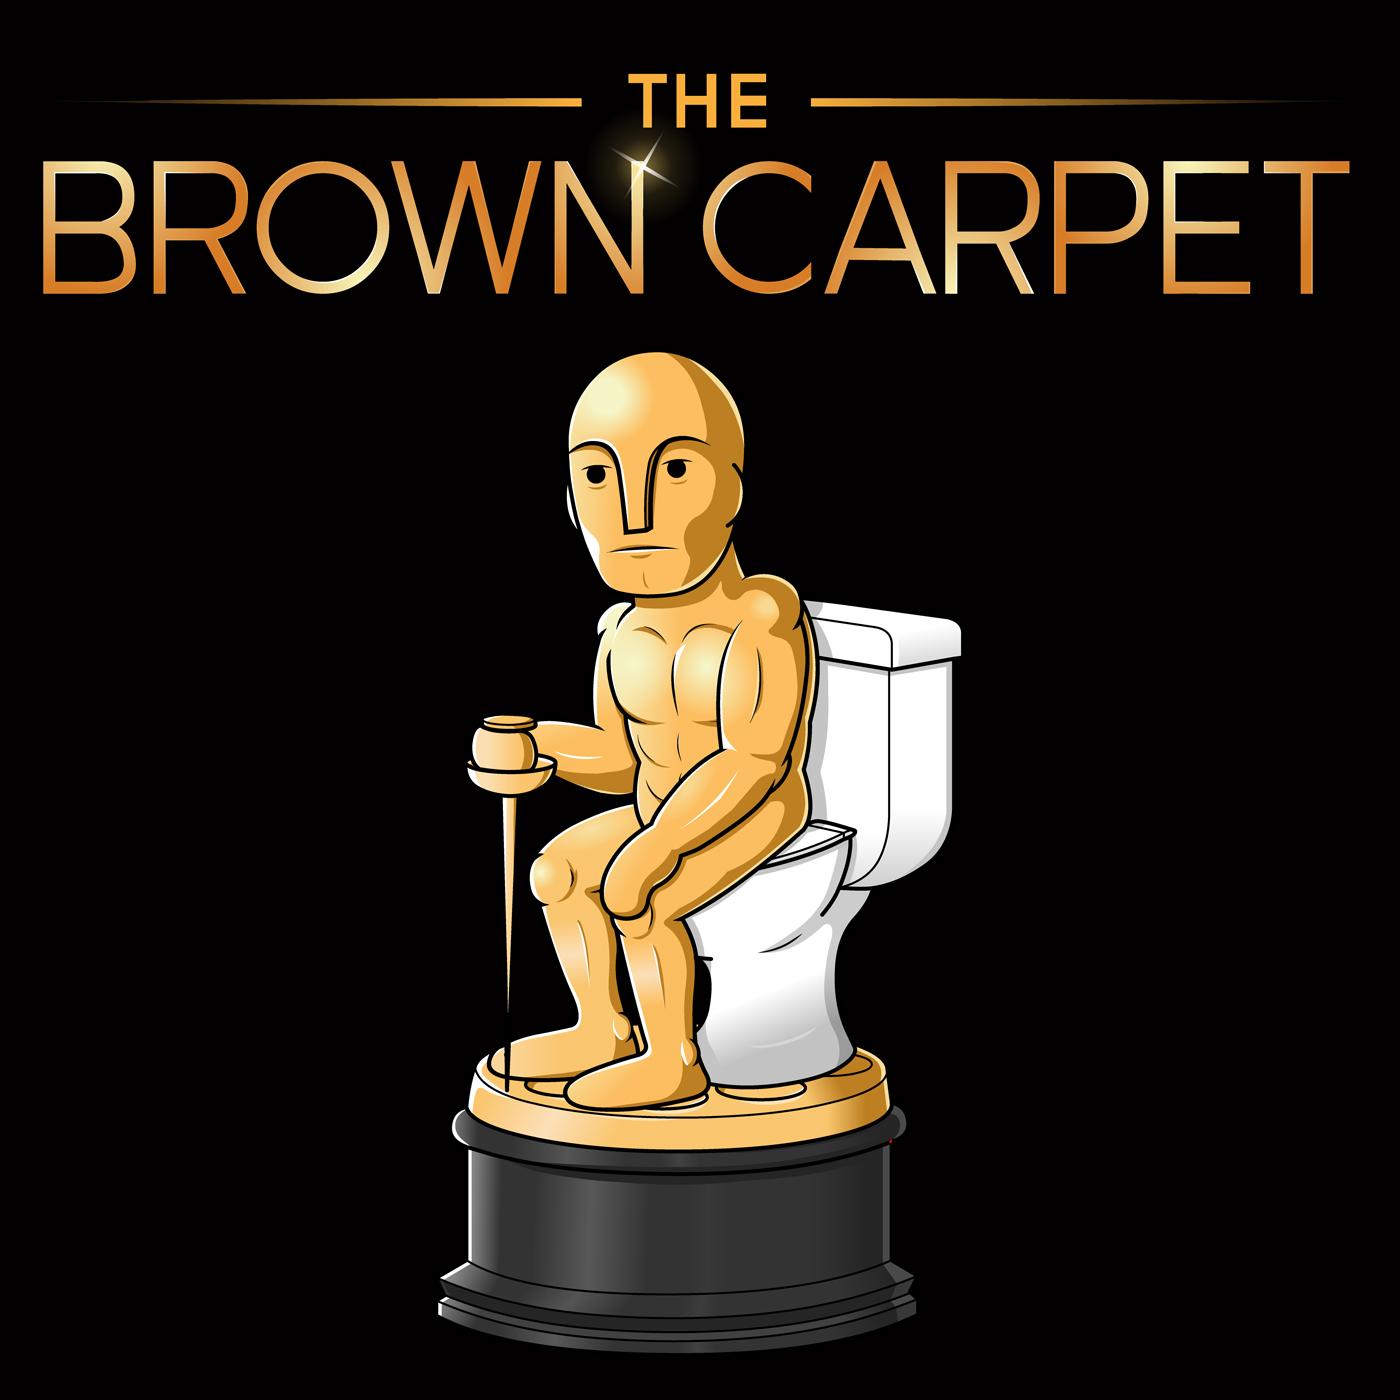 The Brown Carpet show art